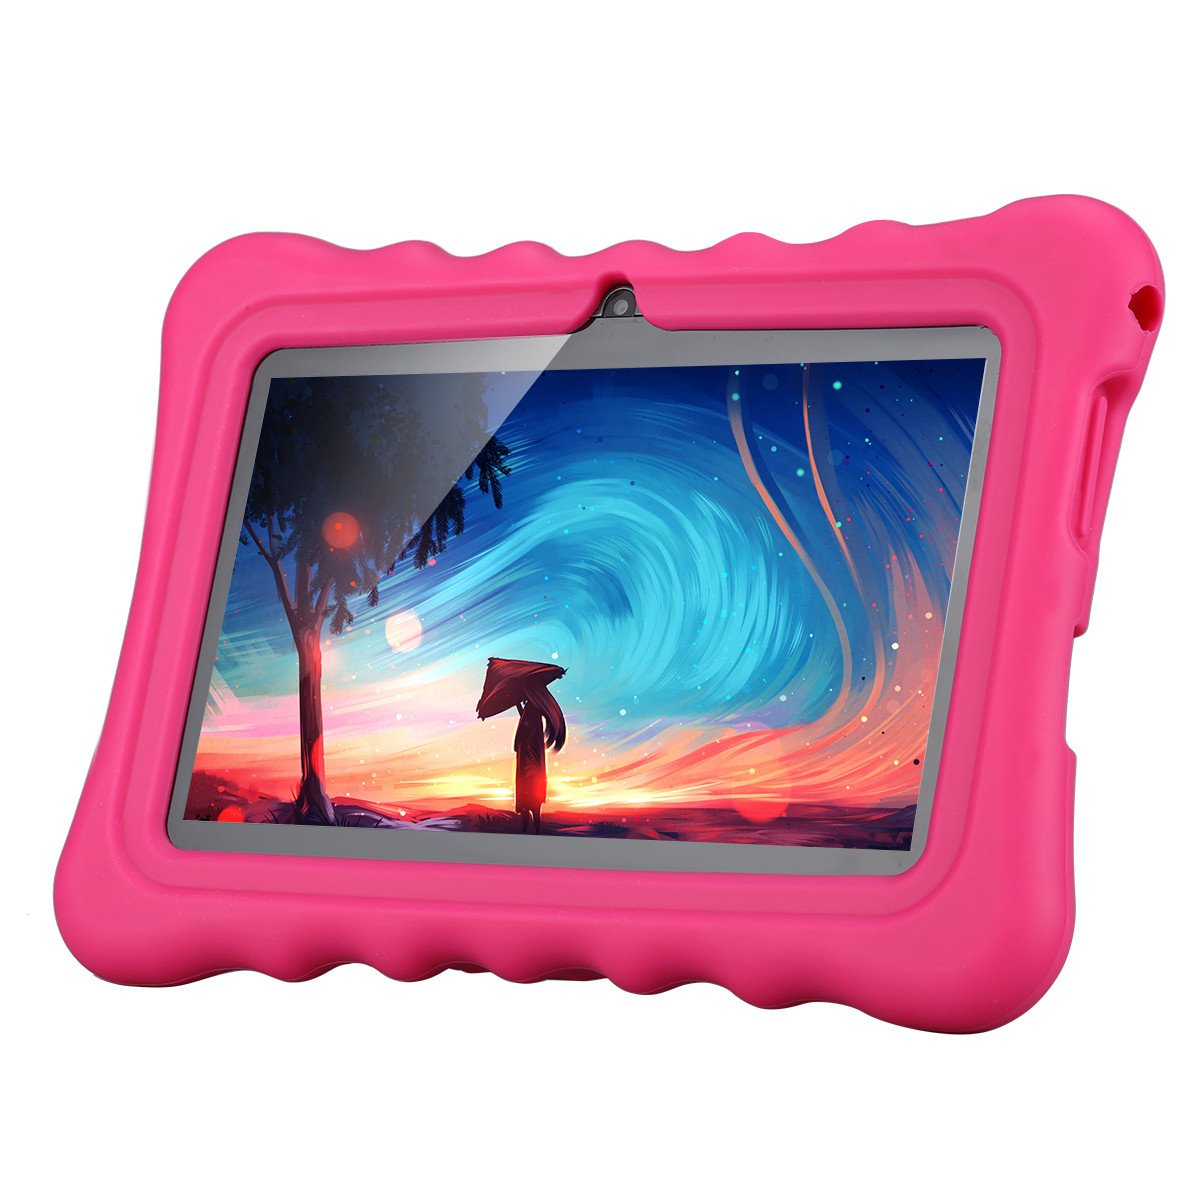 Ainol Q88 Android 7.1 RK3126C Quad Core 1GB+16GB 0.3MP+0.3MP Cam WiFi 2800Ah Tablet PC--Pink by Ainol Q88 (Image #1)